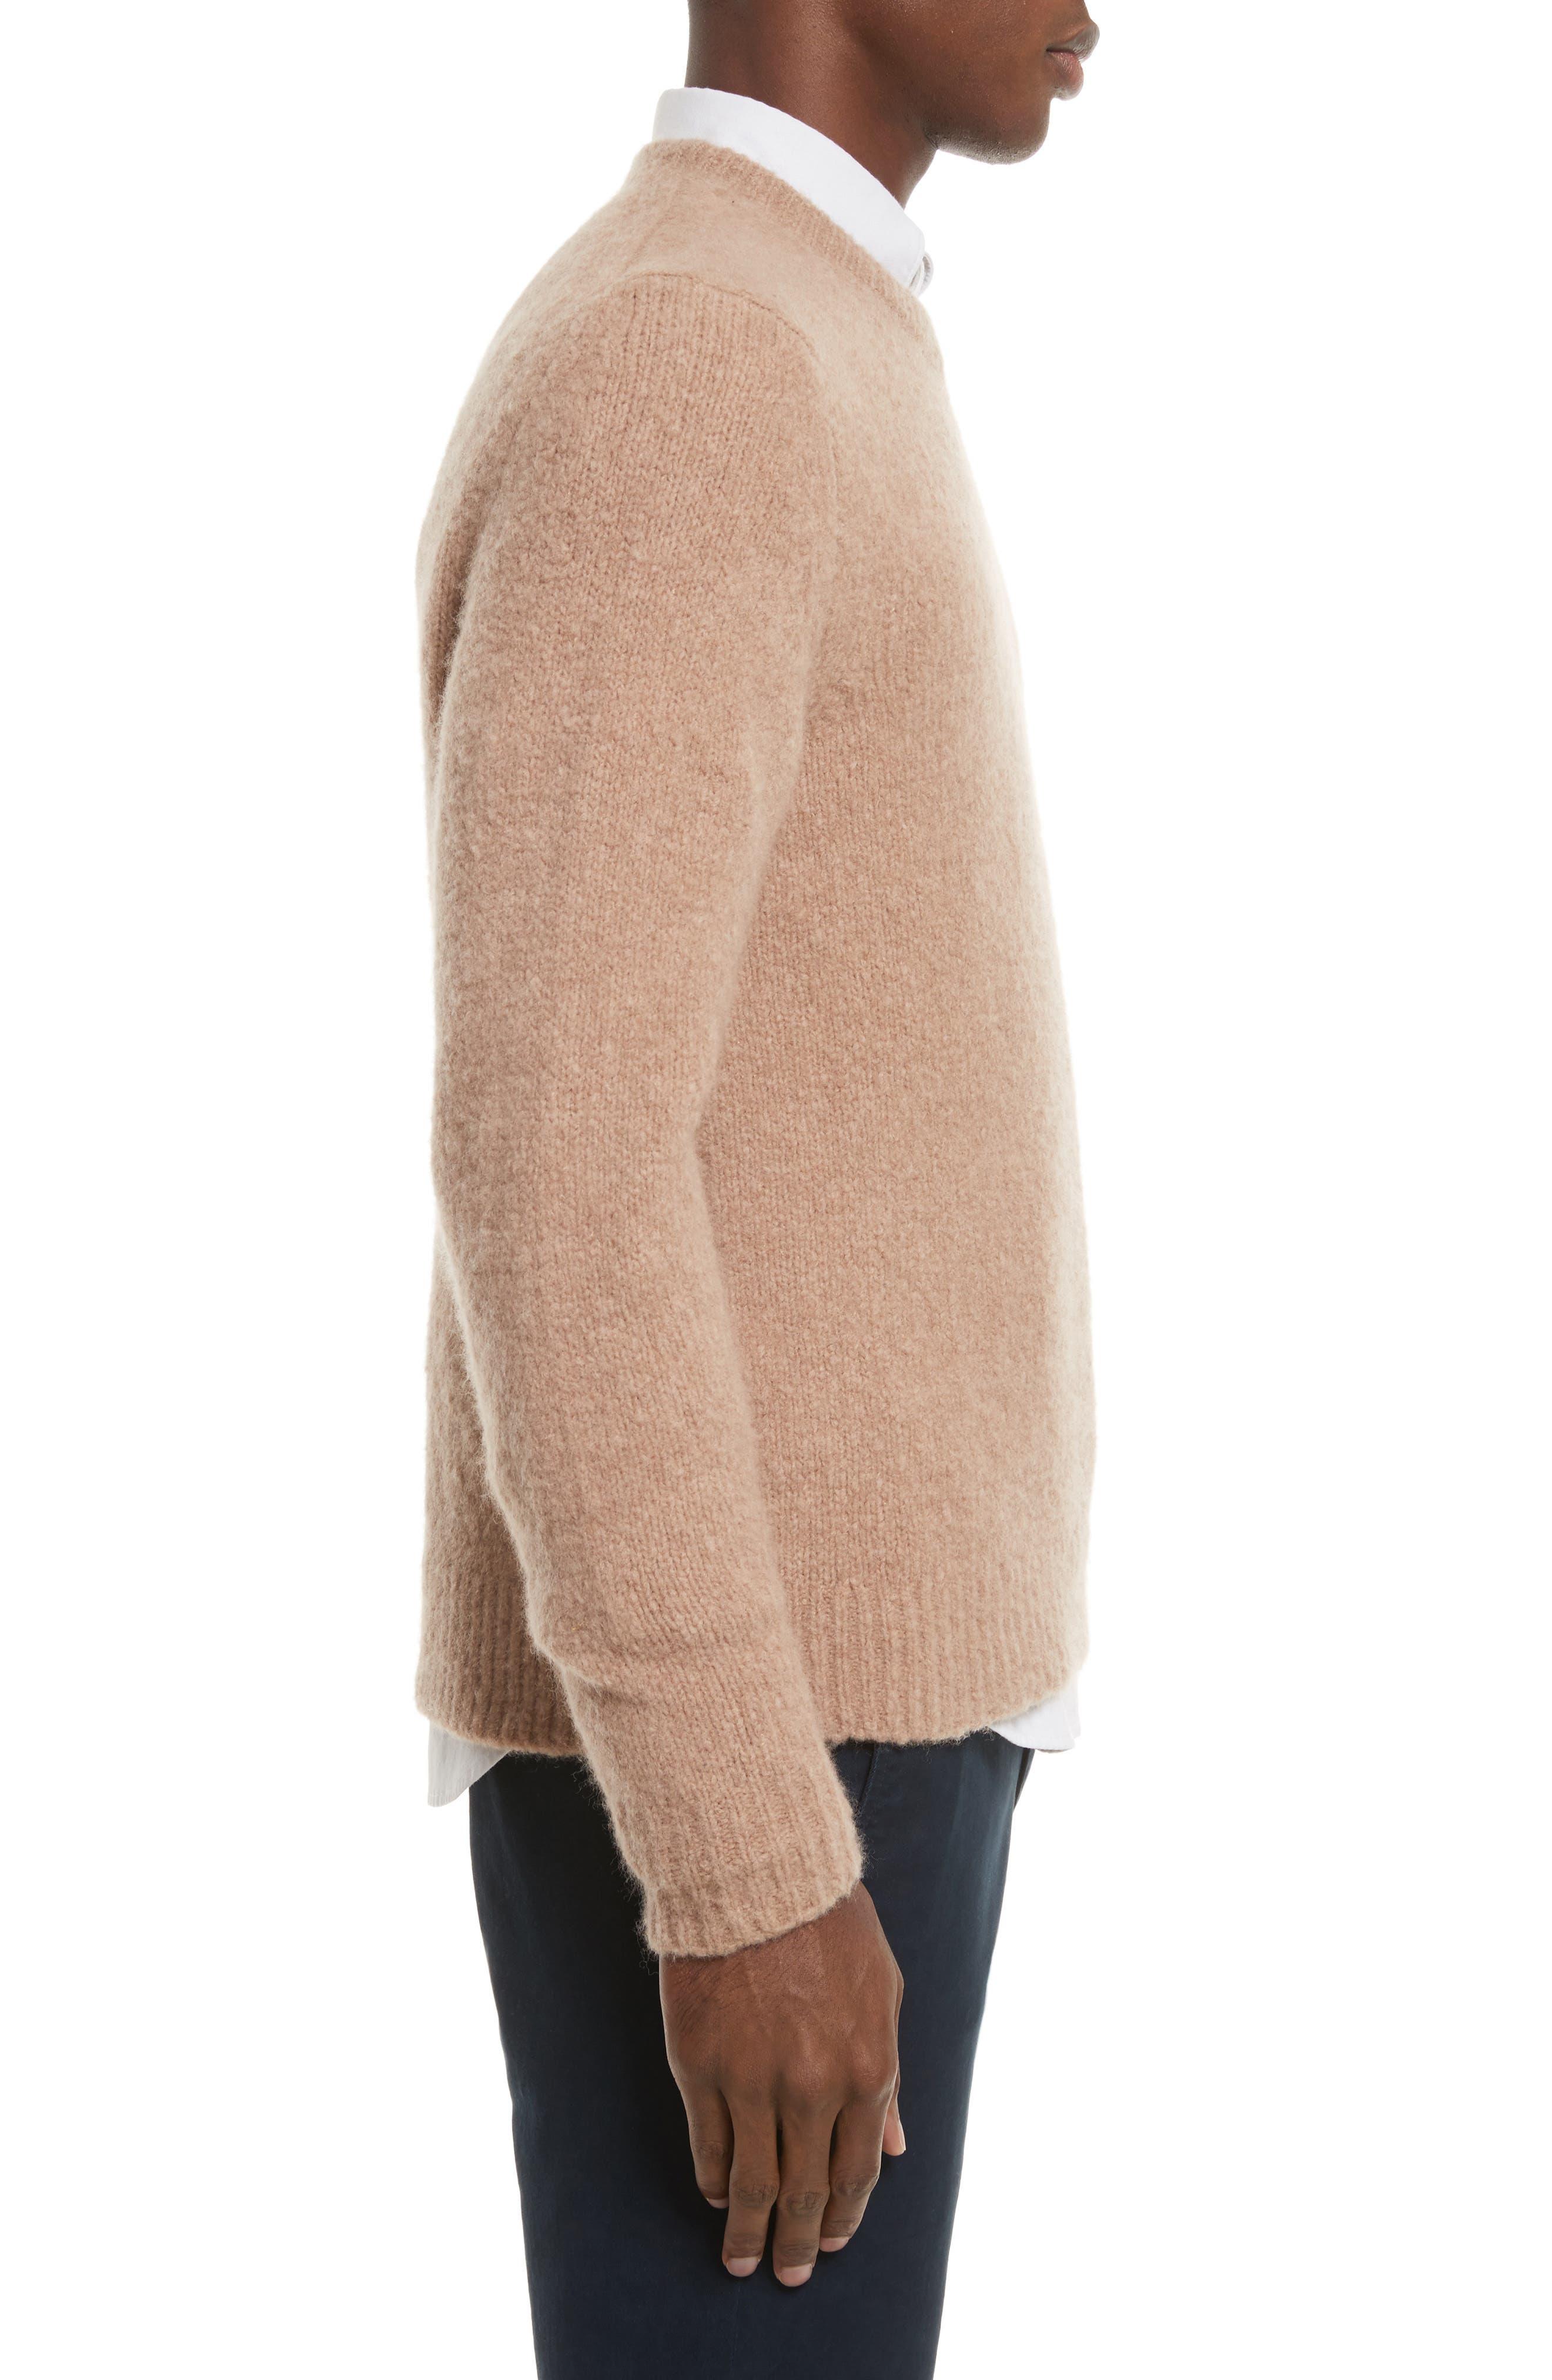 Charles Merino Wool Blend Sweater,                             Alternate thumbnail 3, color,                             230